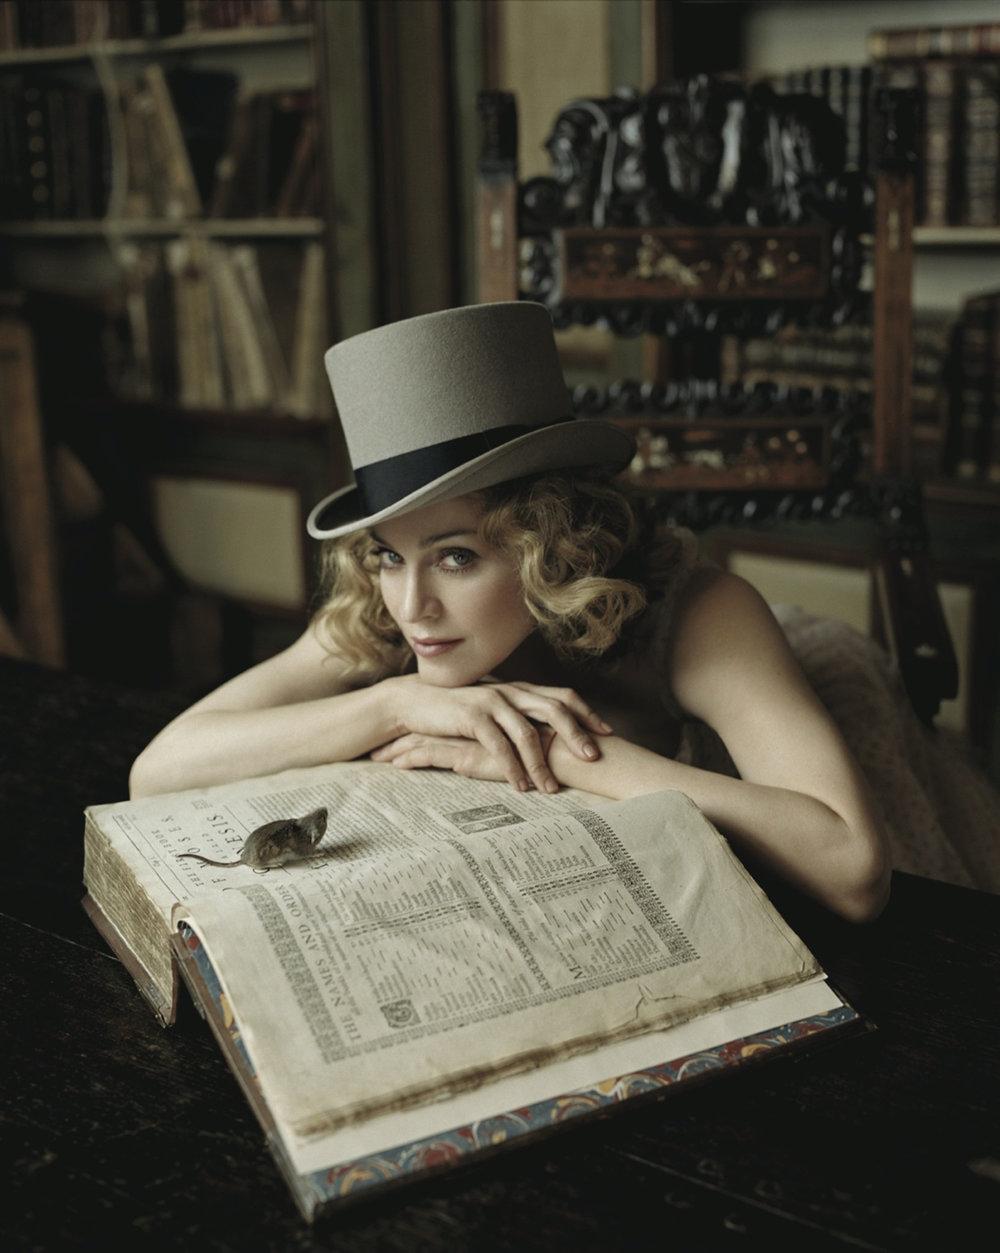 Madonna by Lorenzo Agius  50*60 cm Ed 25  75*100 cm Ed 15  100*120 cm Ed 5  Prices from 3000 pund